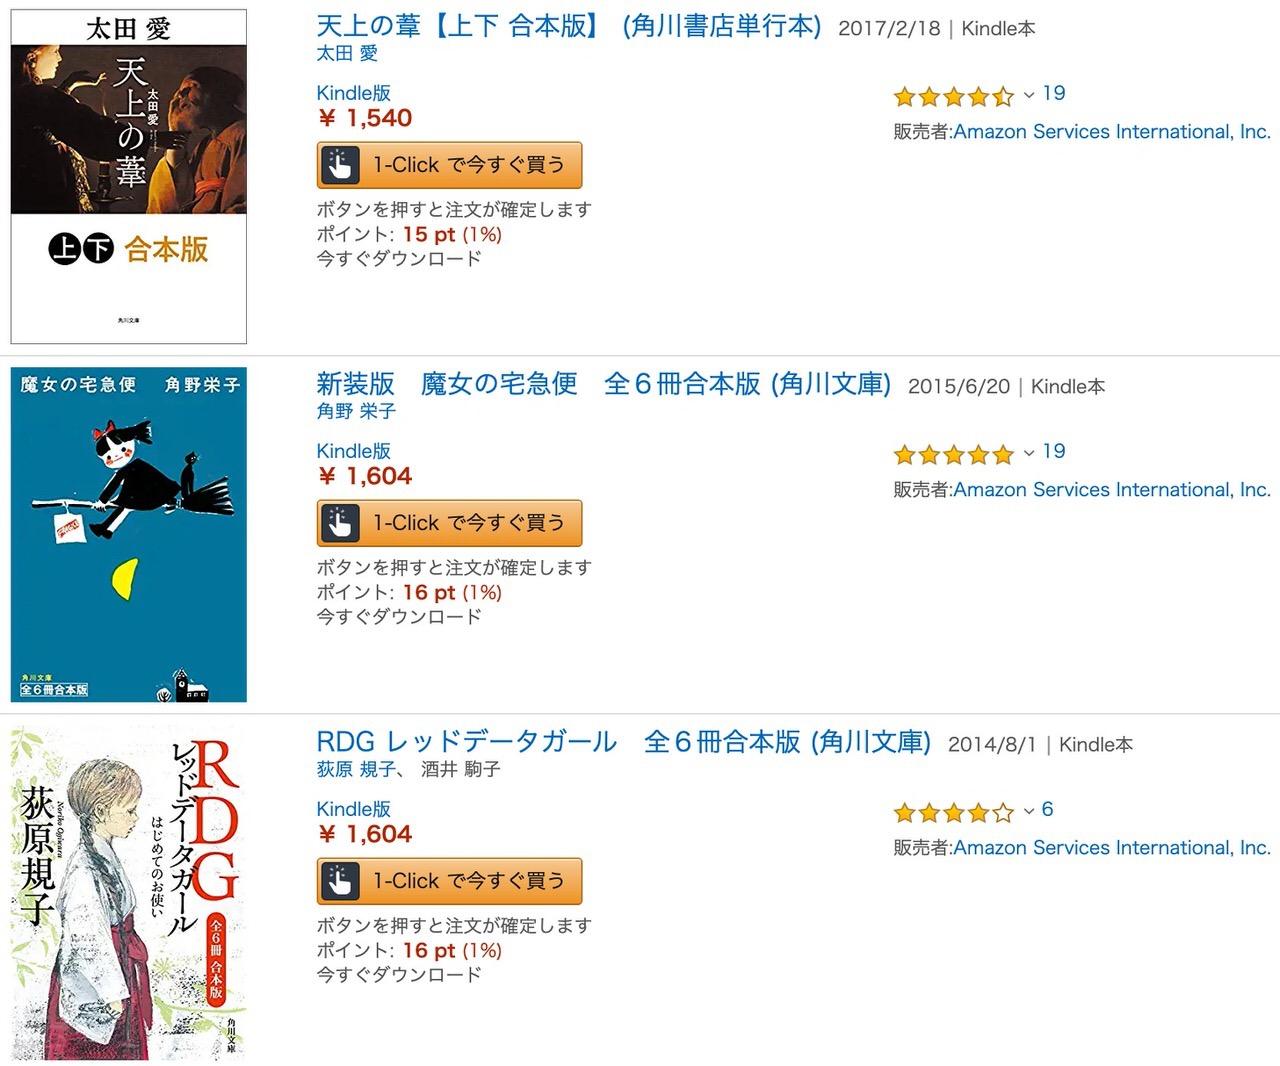 【Kindleセール】魔女の宅急便、角川まんが学習シリーズなど「KADOKAWA 人気の合本フェア」(9/19まで)